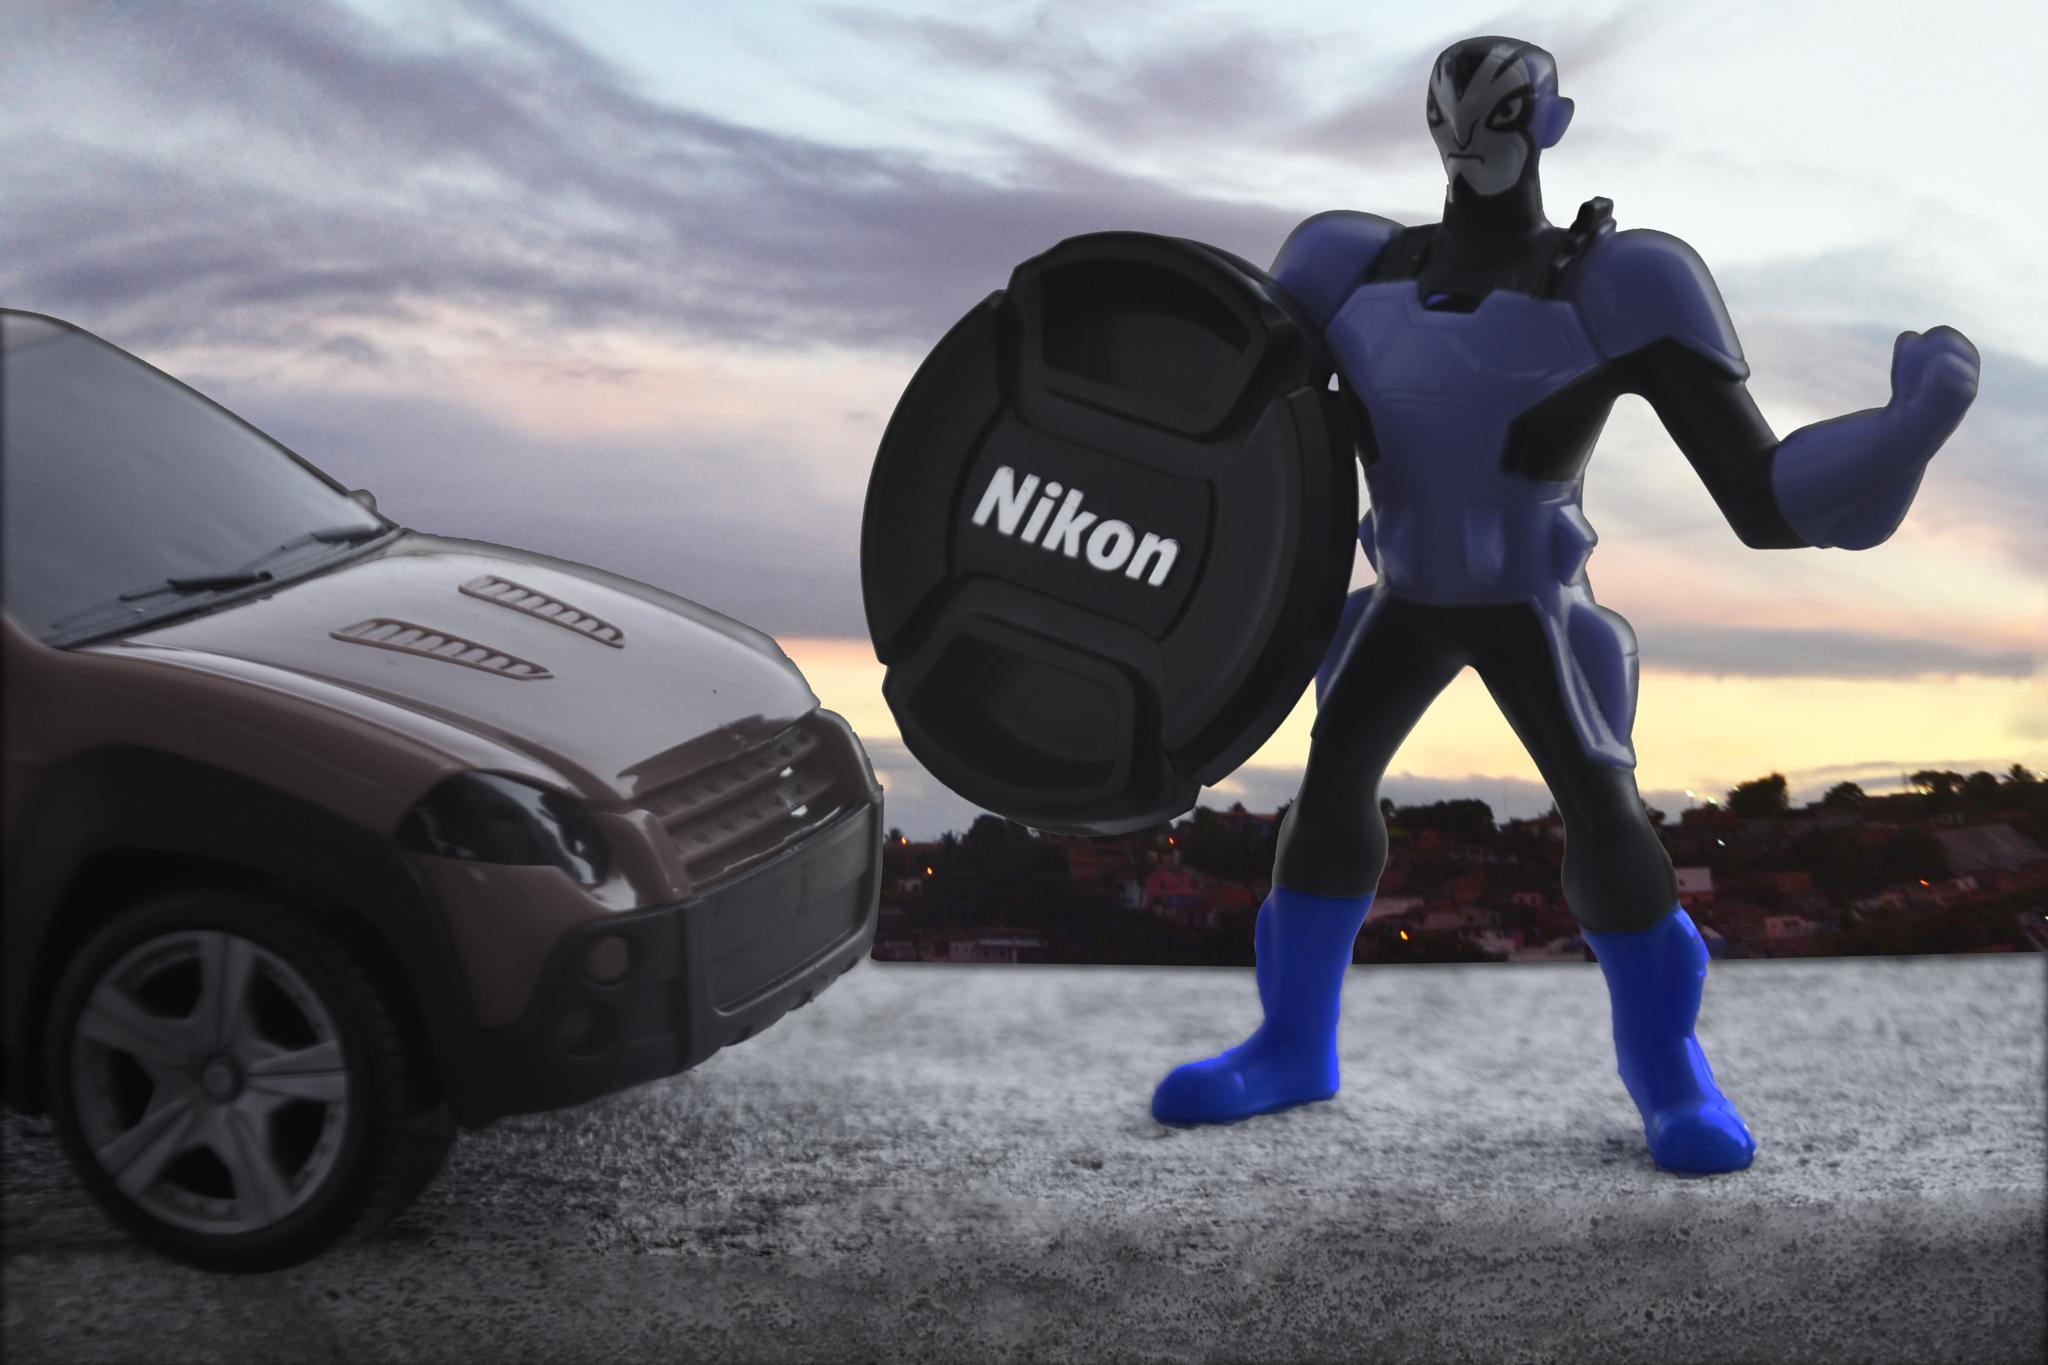 Super Nikon by Lau  Loko -Lokos Por Imagens